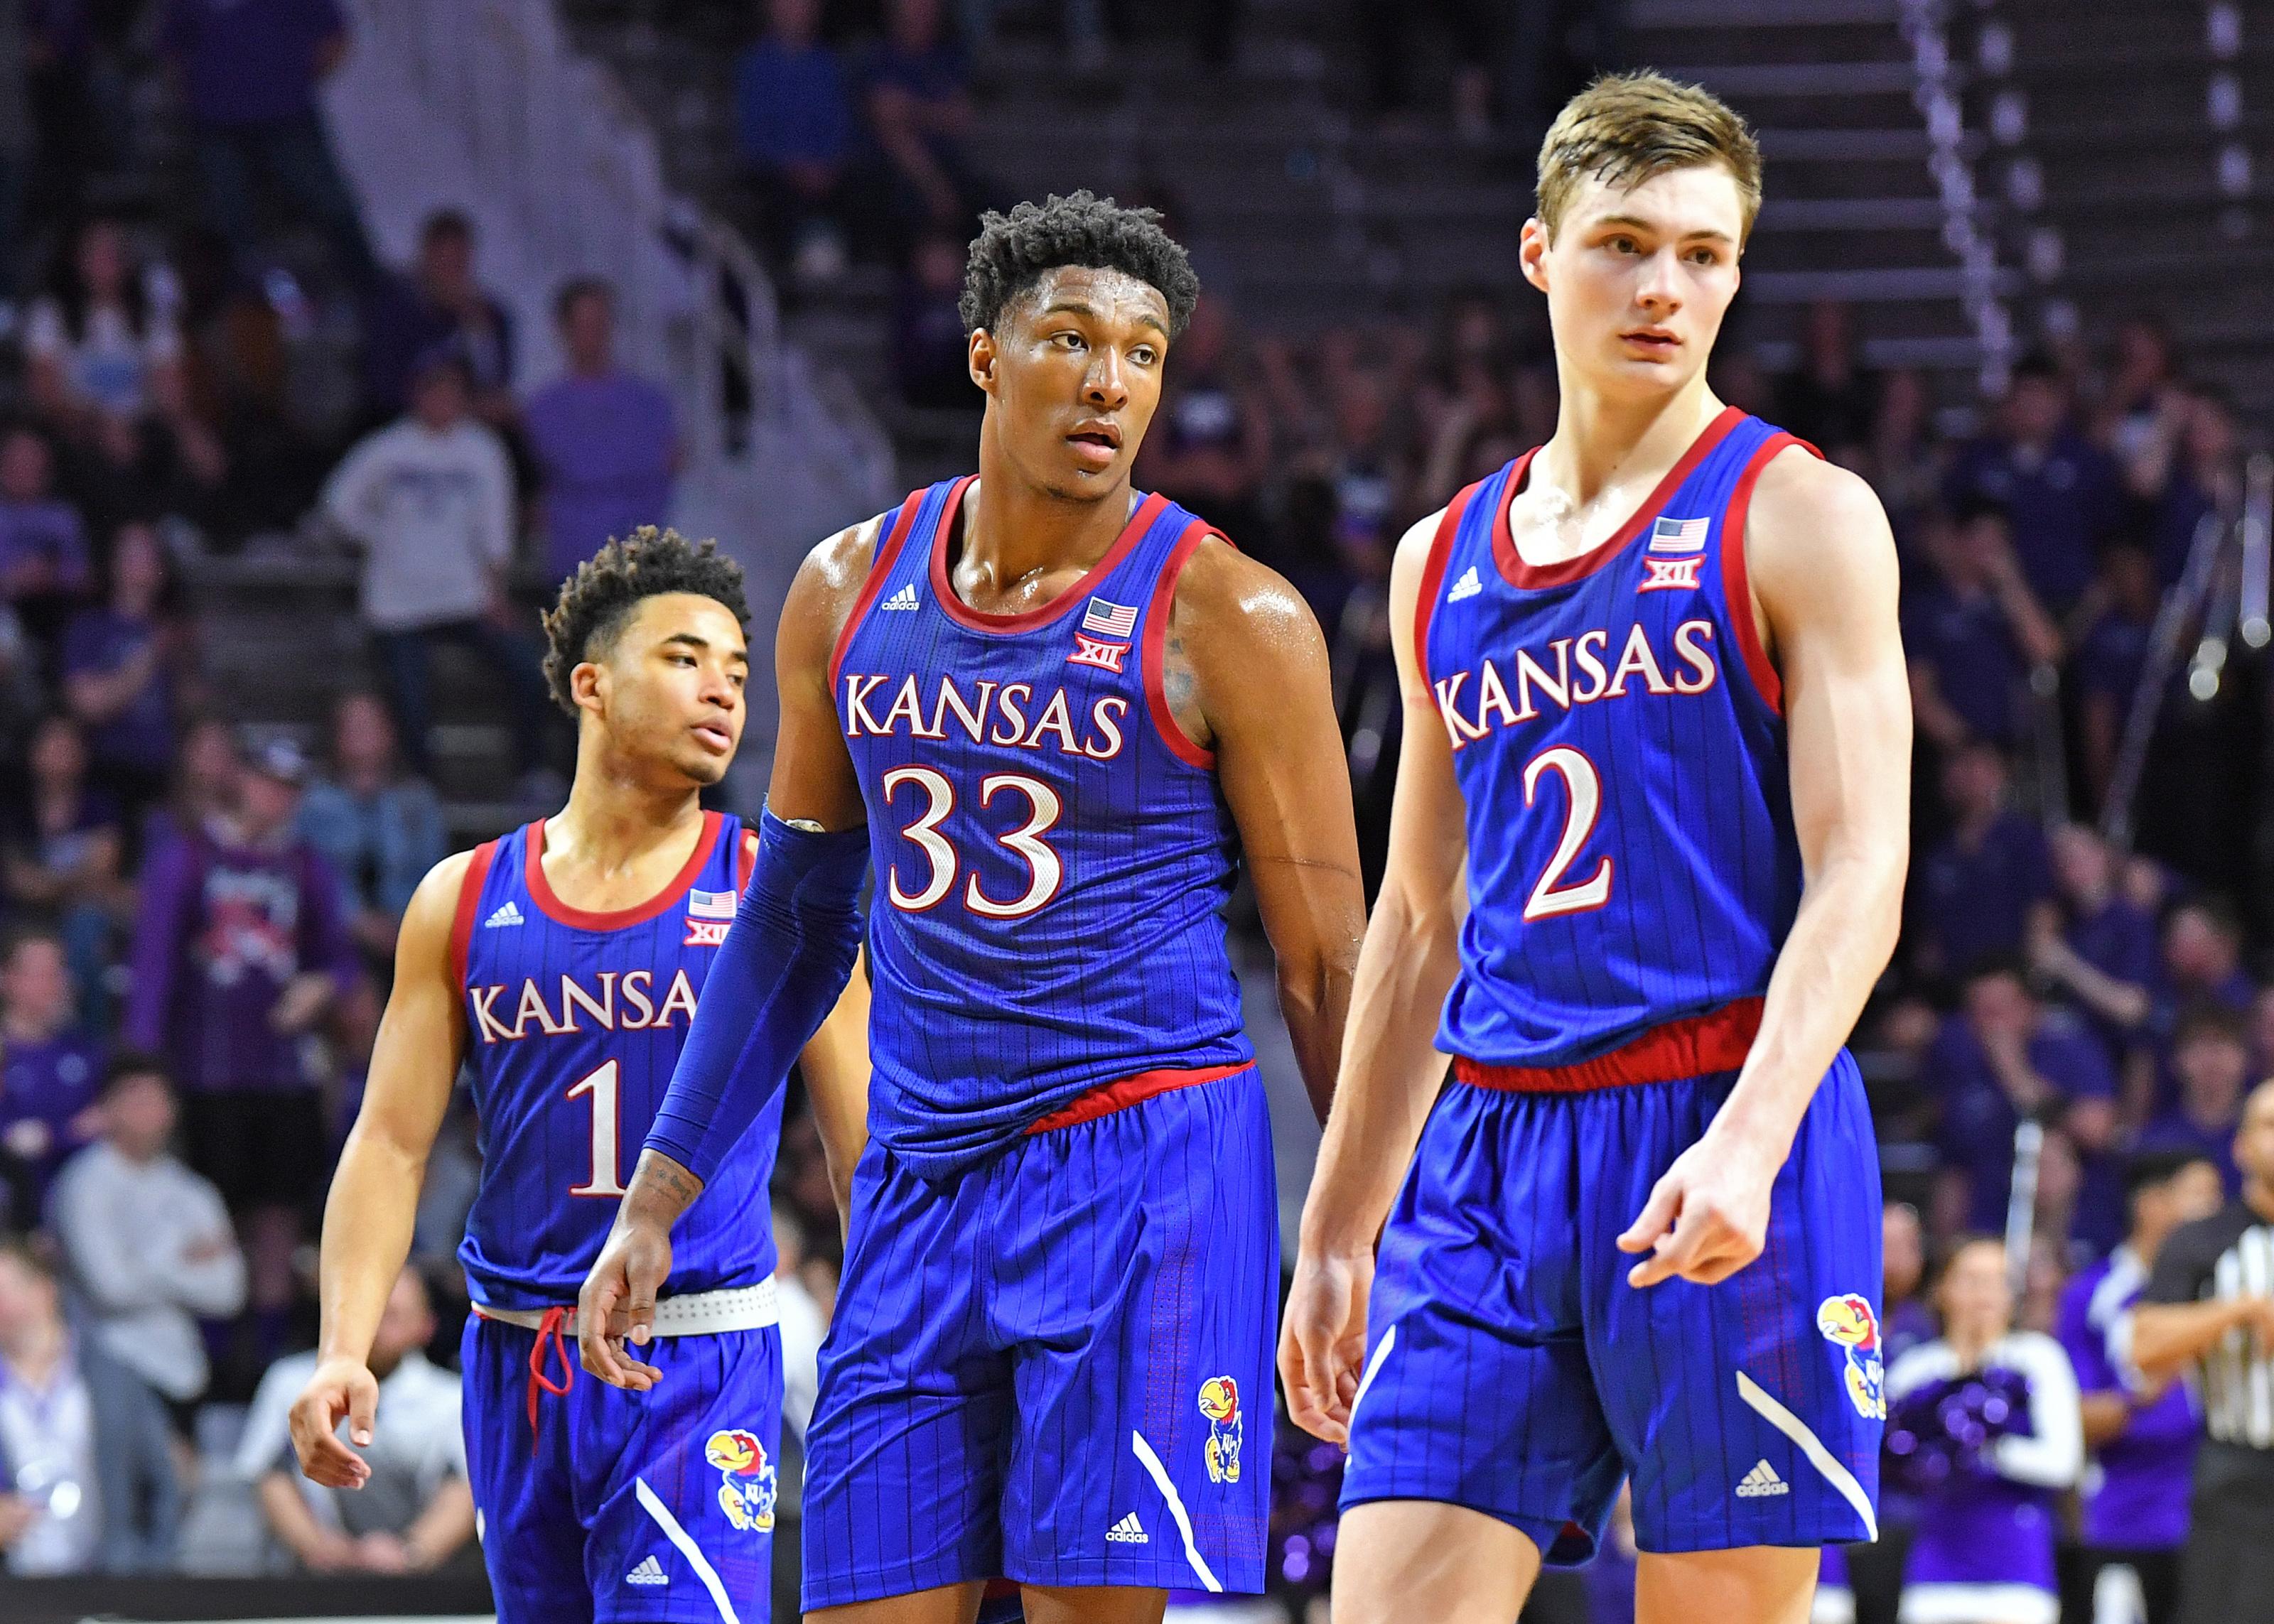 Kansas Basketball: 2020-2021 season in jeopardy due to COVID-19 pandemic